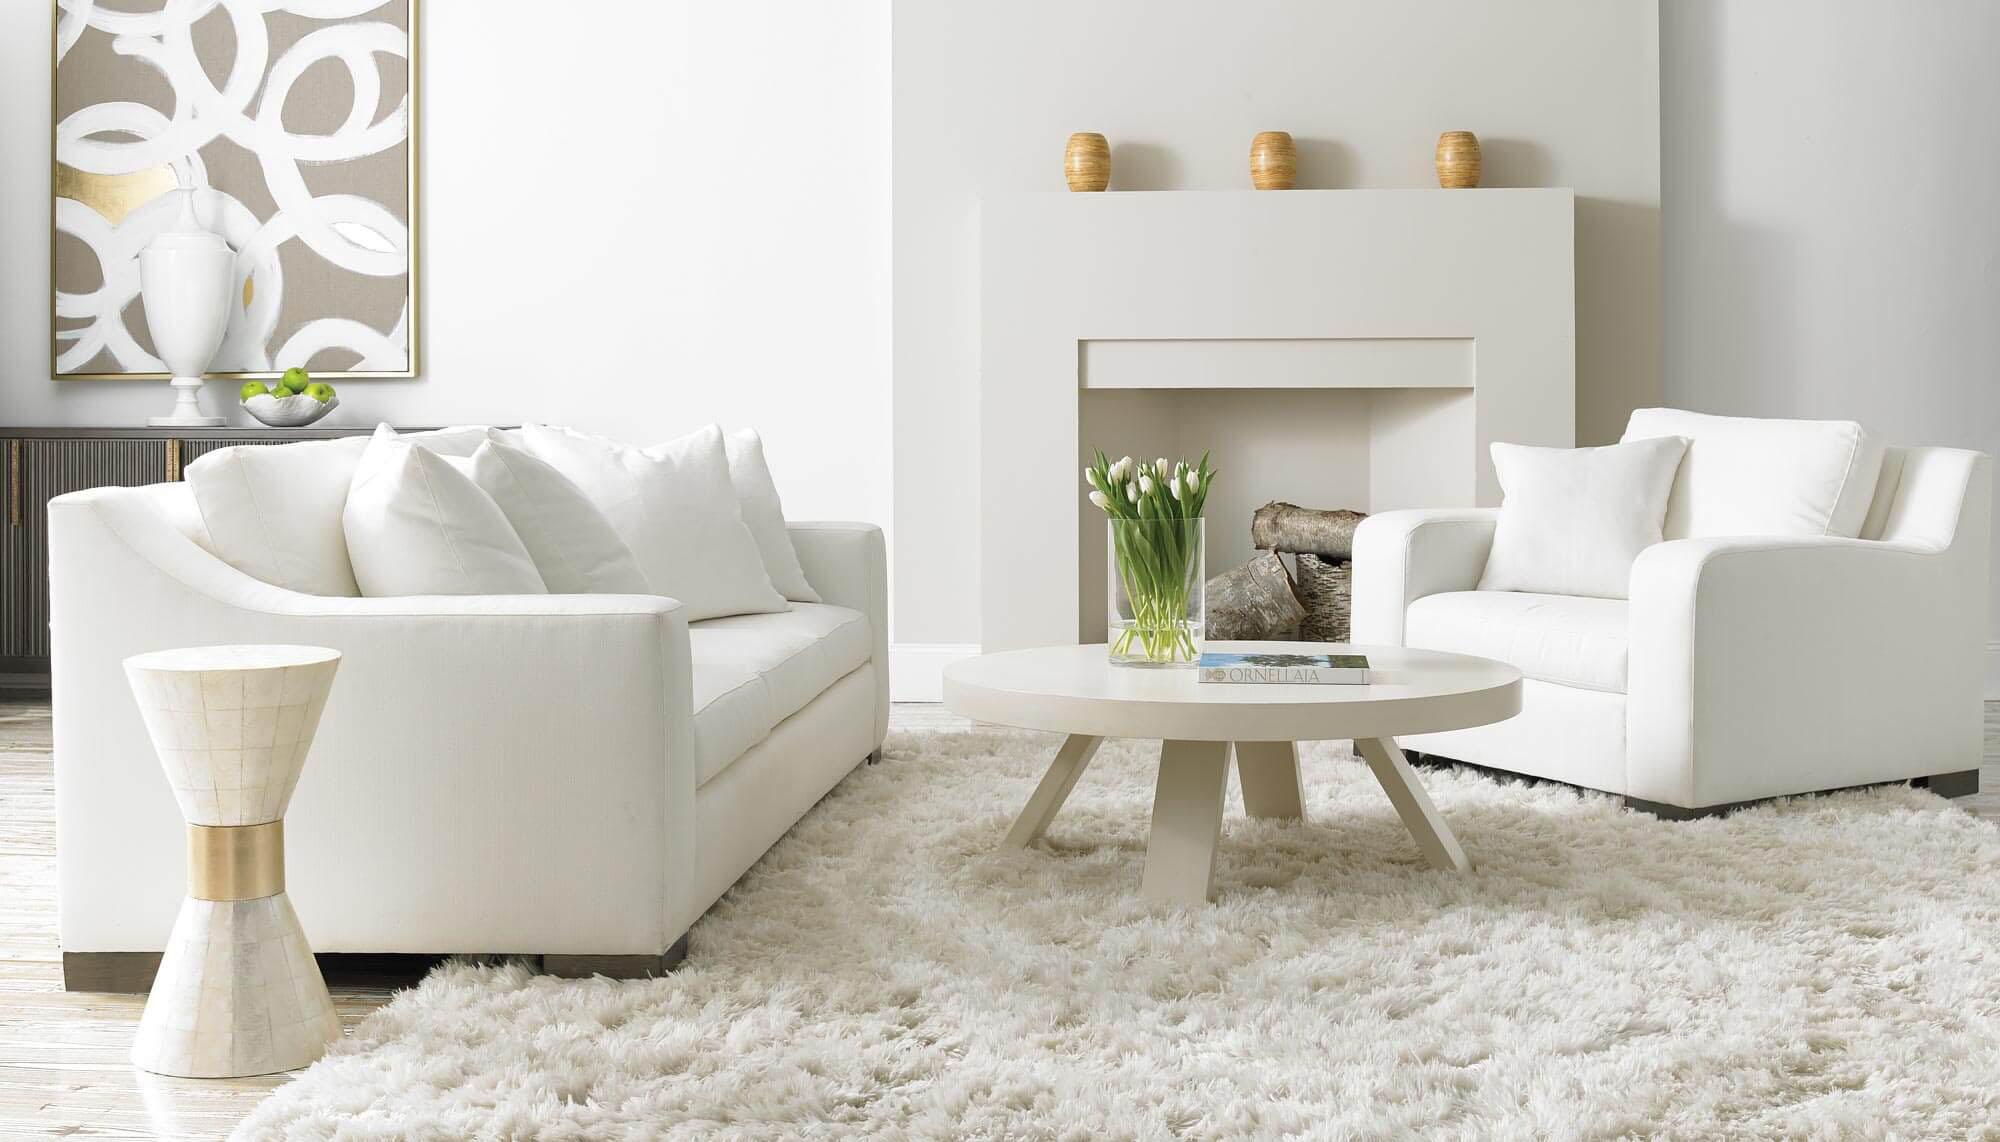 Sherrill white sofa and chair